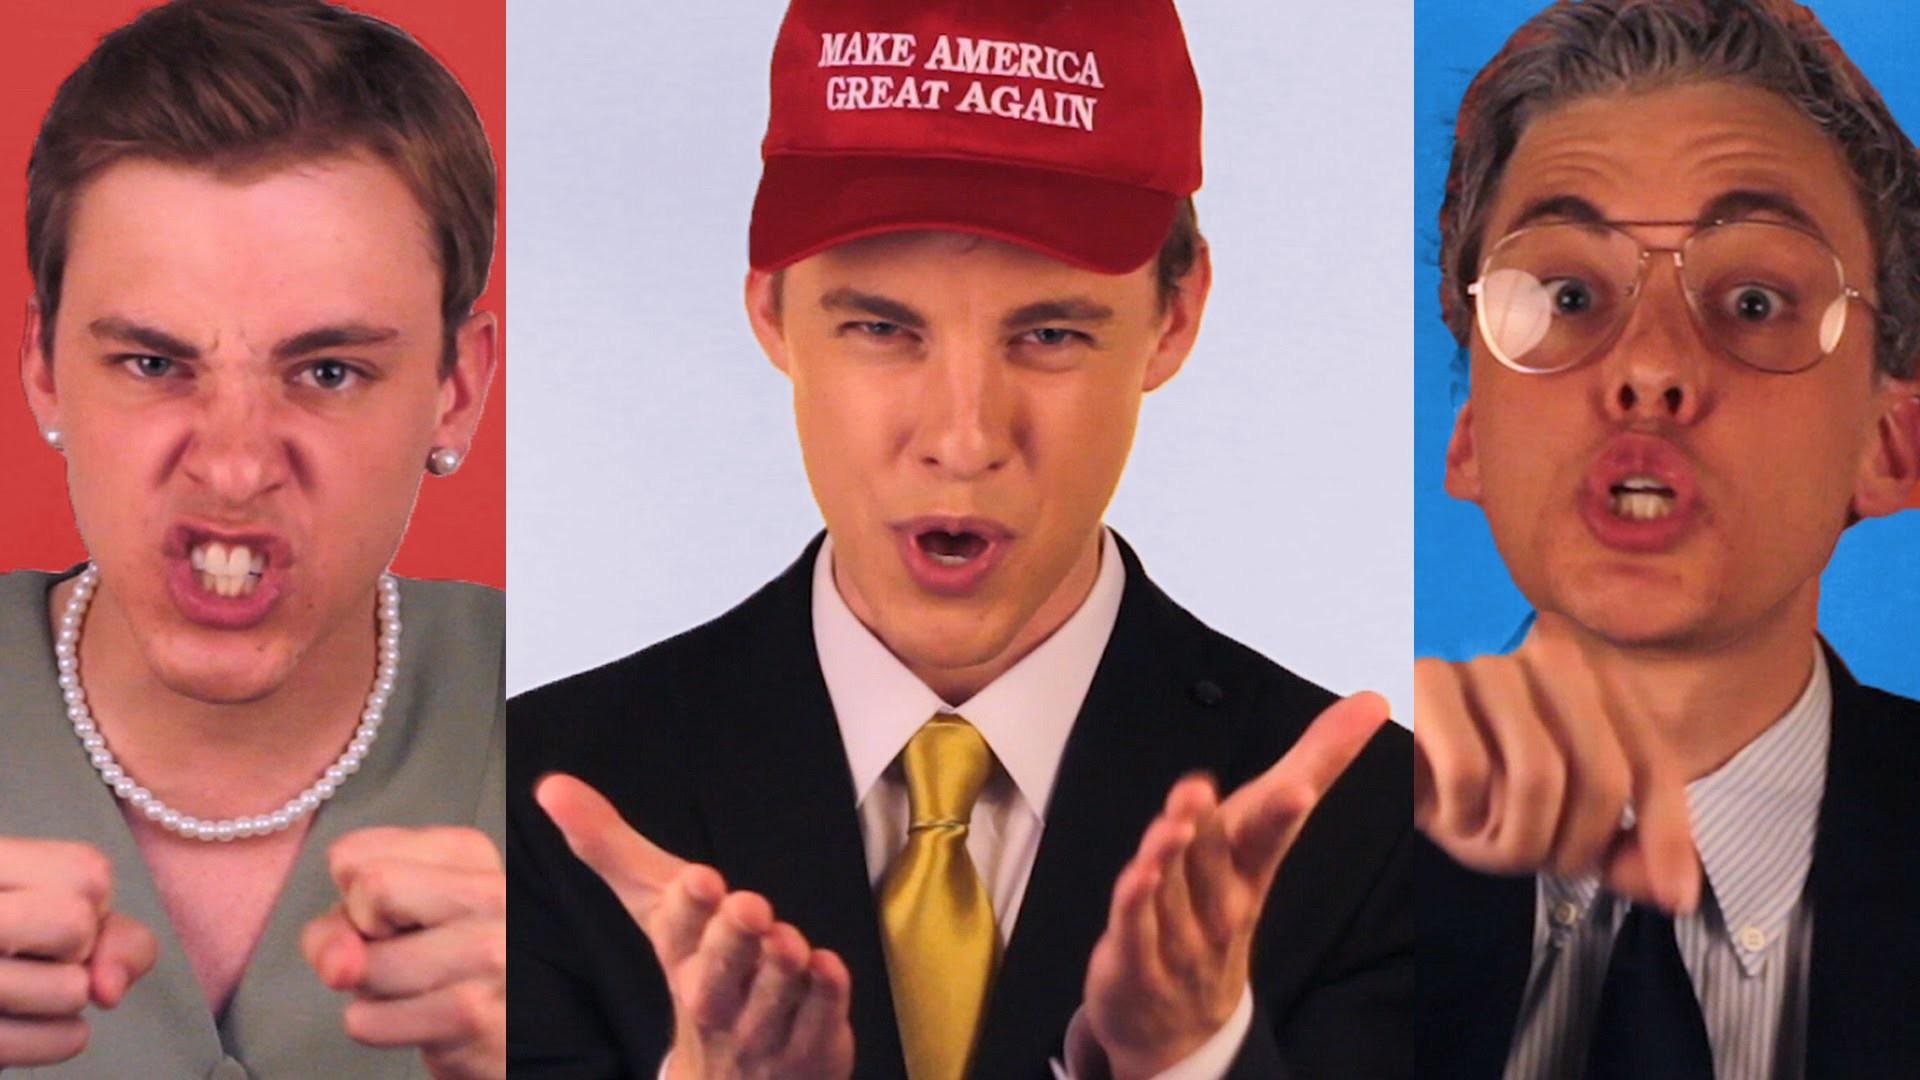 POLITICLASH: Donald Trump vs Hillary Clinton vs Bernie Sanders – YouTube